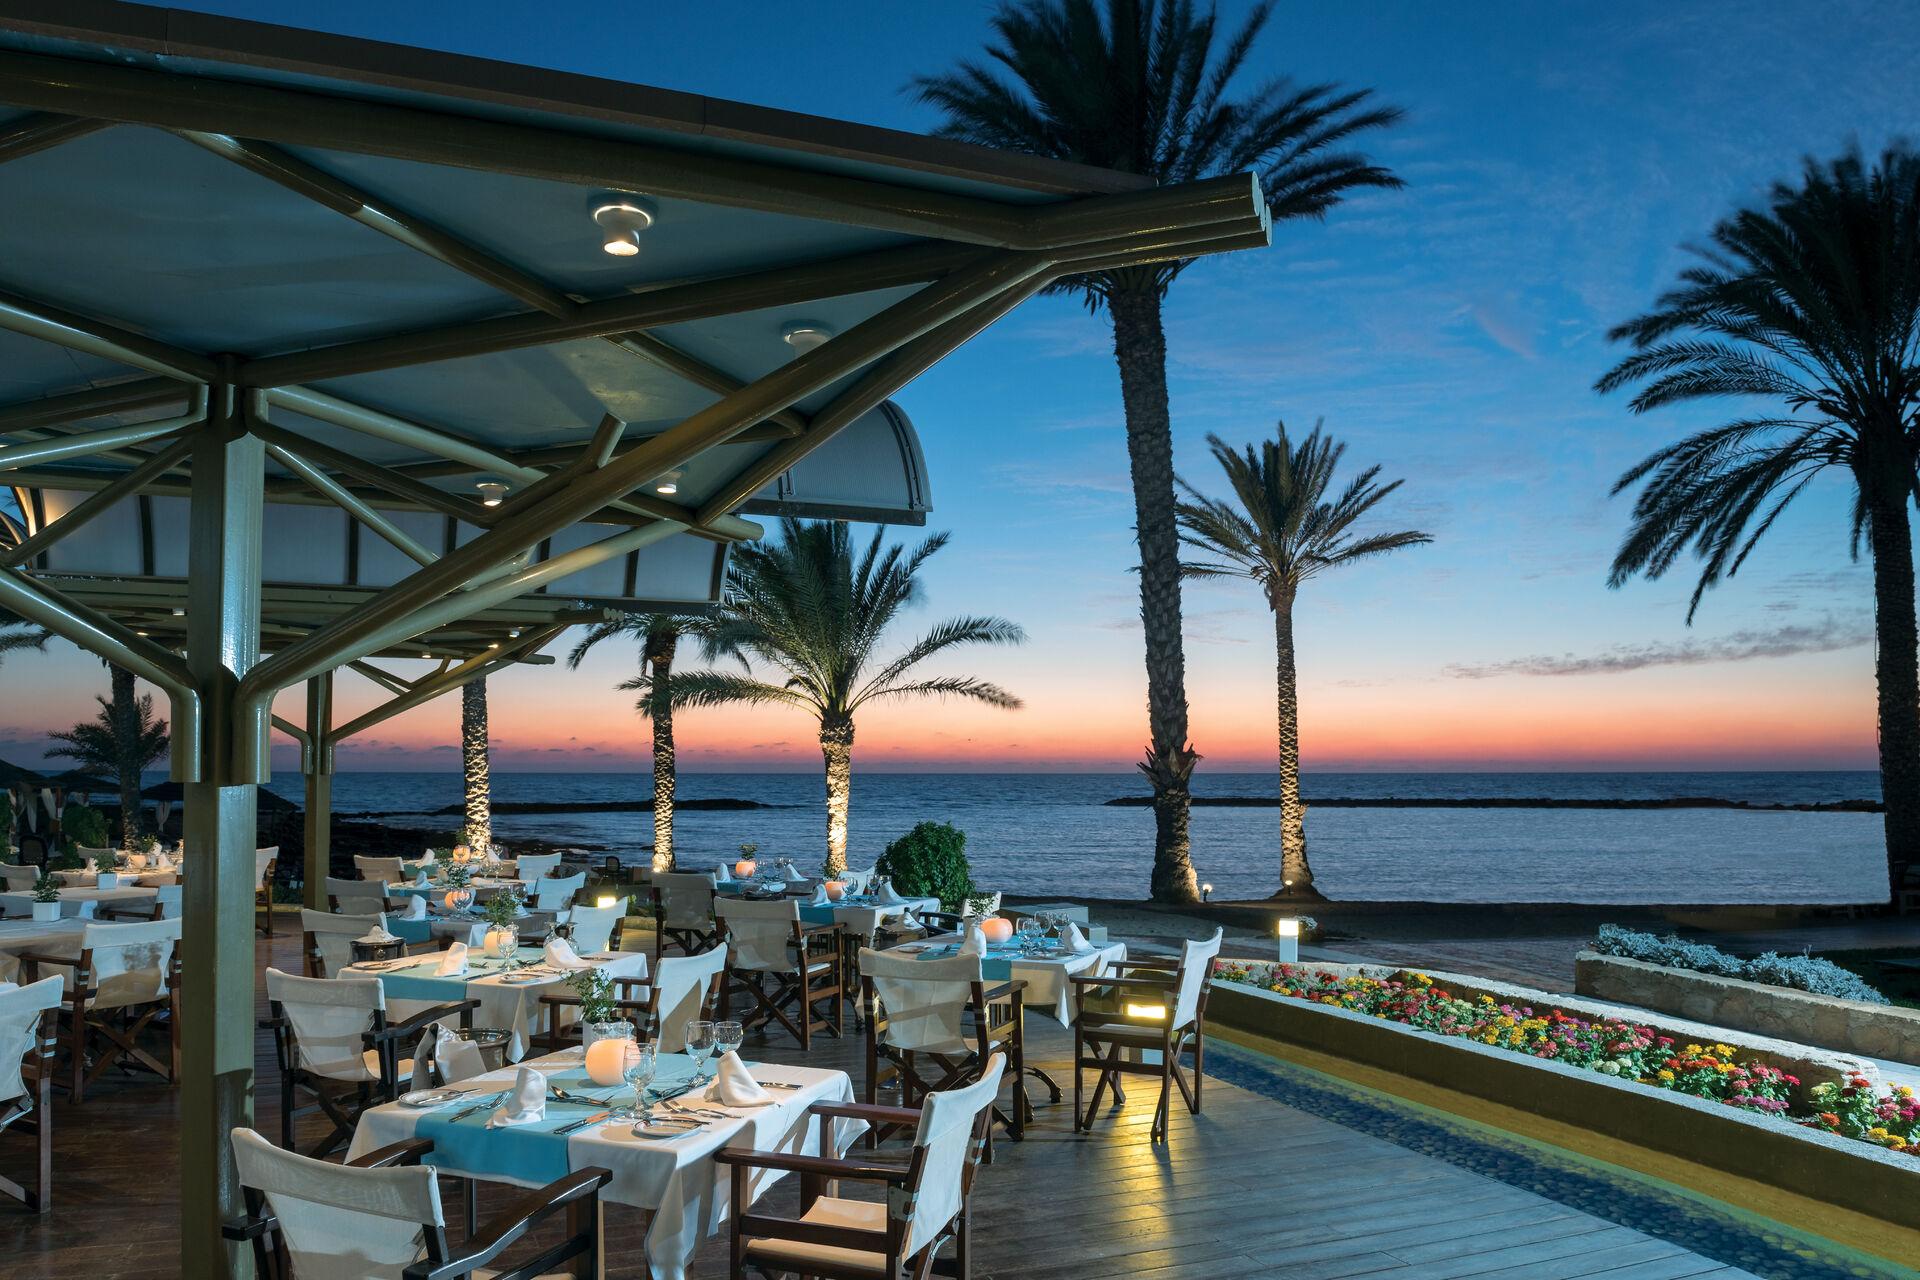 https://cms.satur.sk/data/imgs/tour_image/orig/12-pioneer-beach-hotel-thalassa-mediterranean-restaurant-1972637.jpg